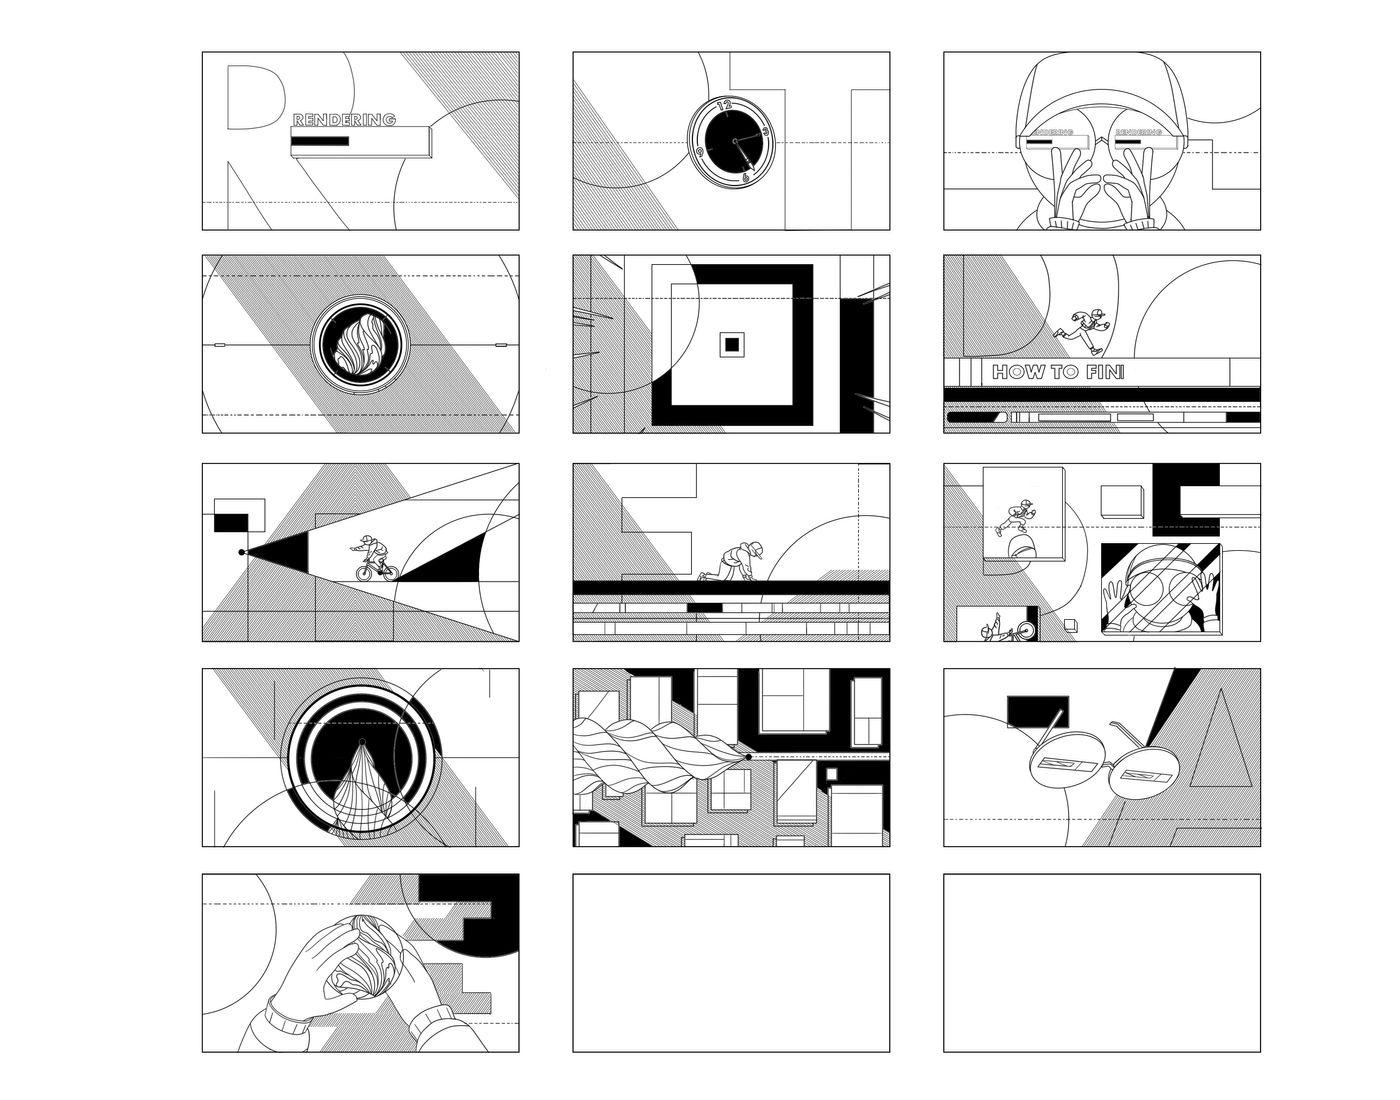 Storyboard%20 Yunhopark